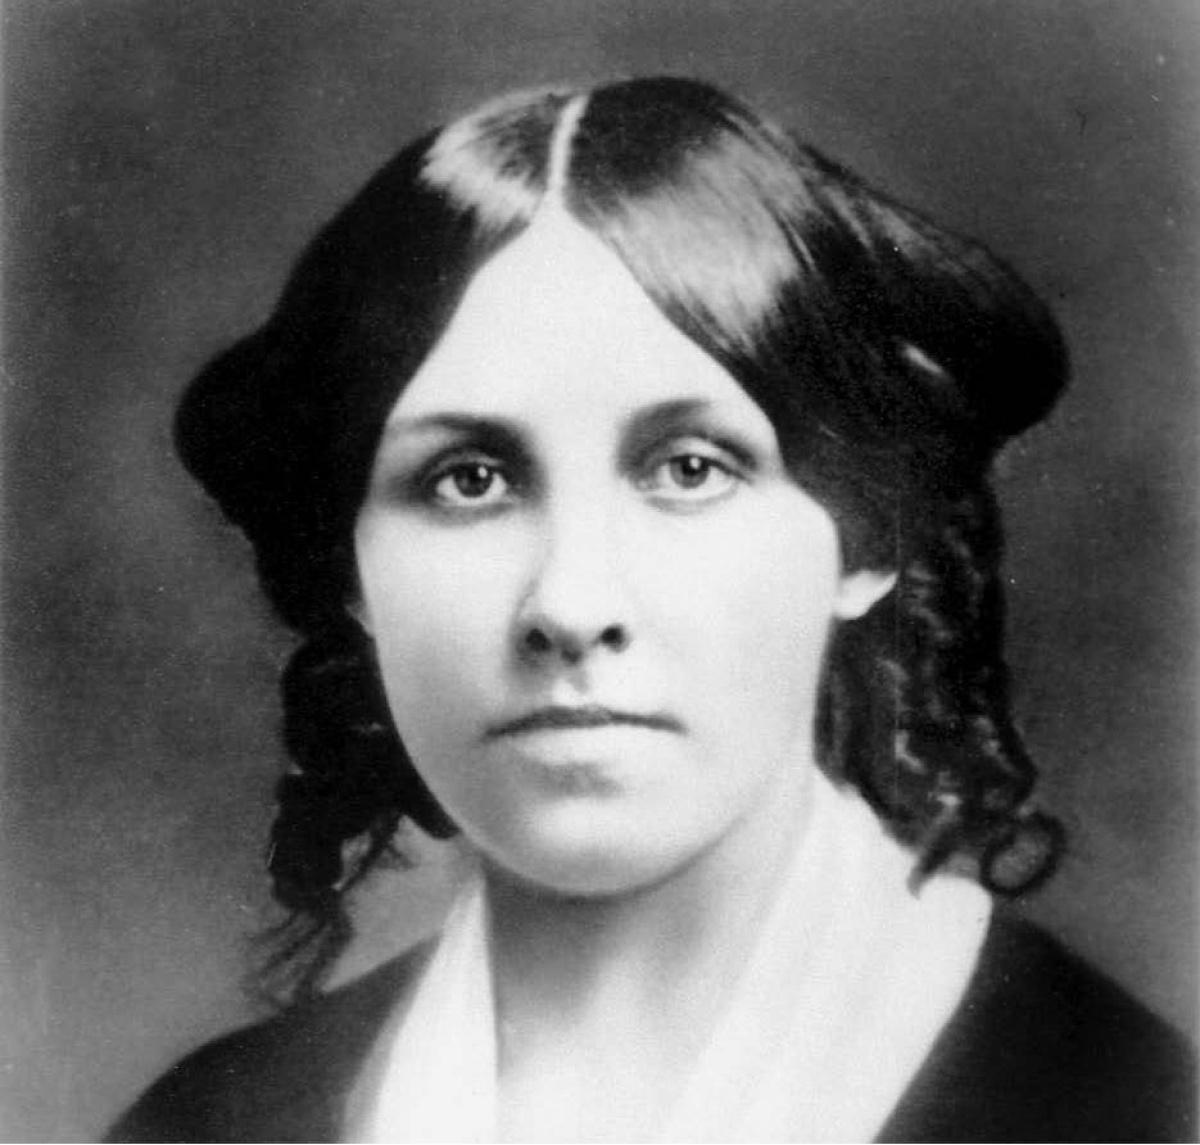 Louisa May Alcott, writer of Little Women